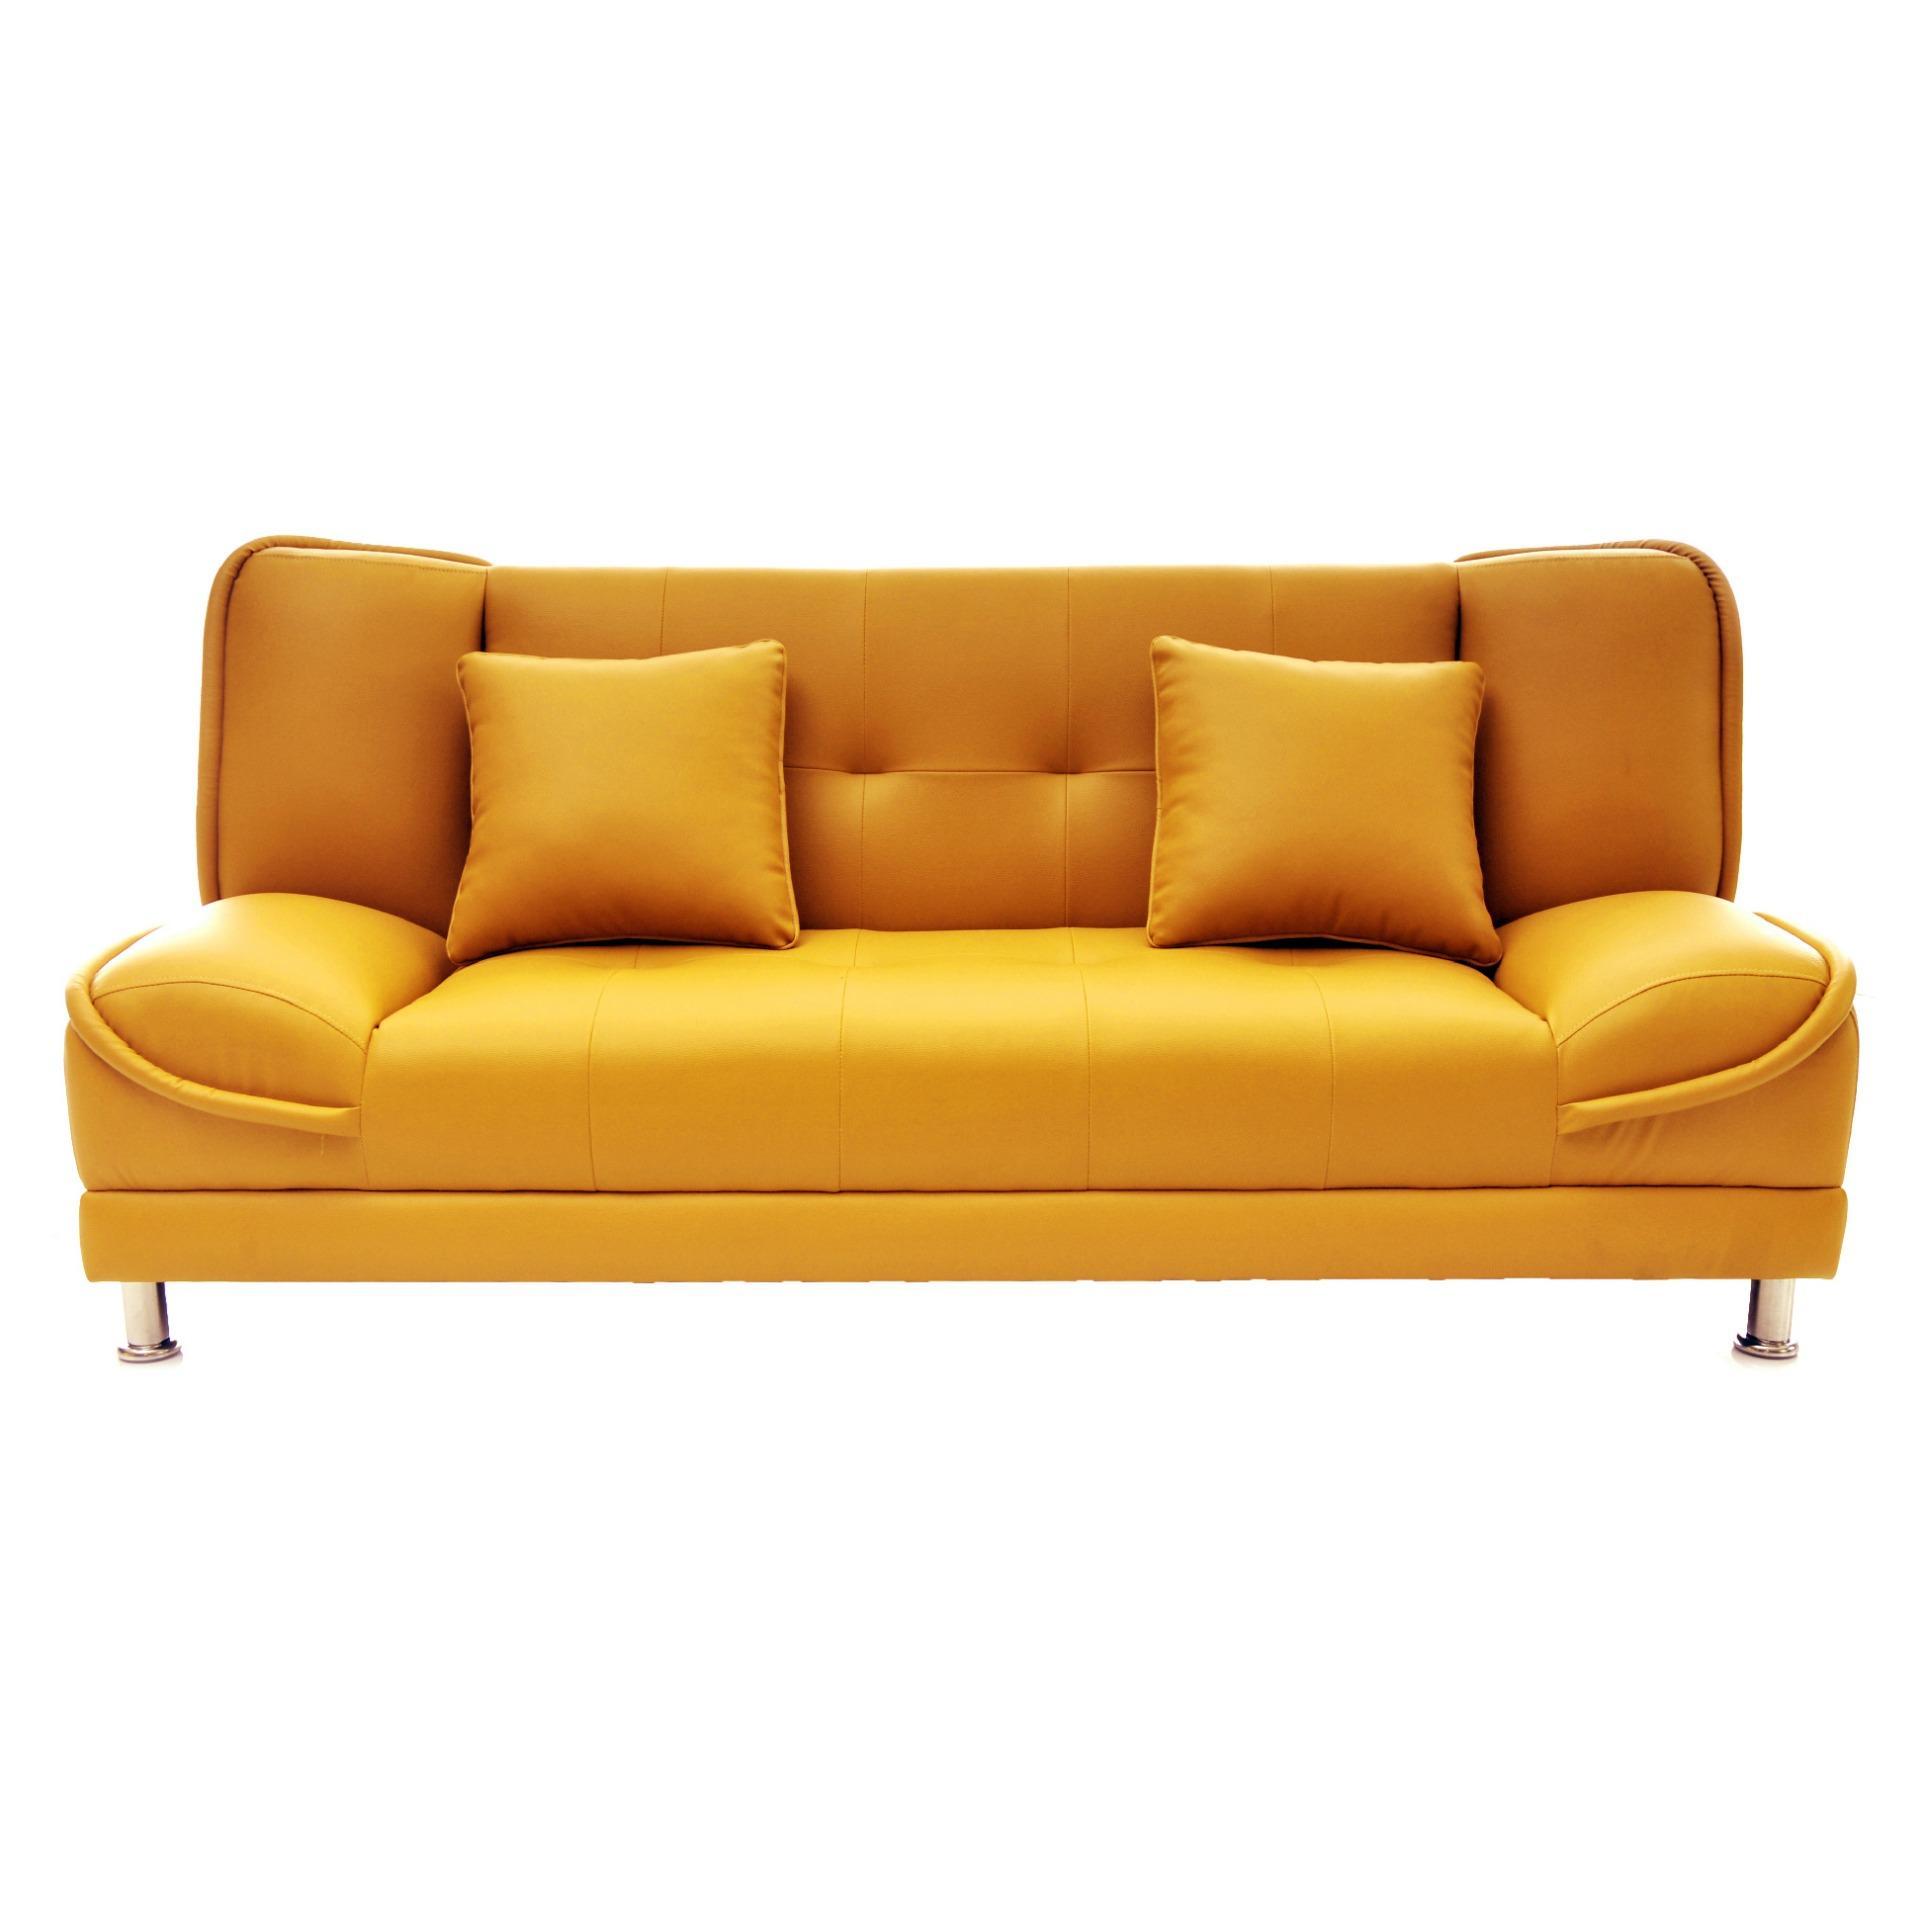 Harga Olc Sofabed Nok14 Oranye Jabodetabek Only New